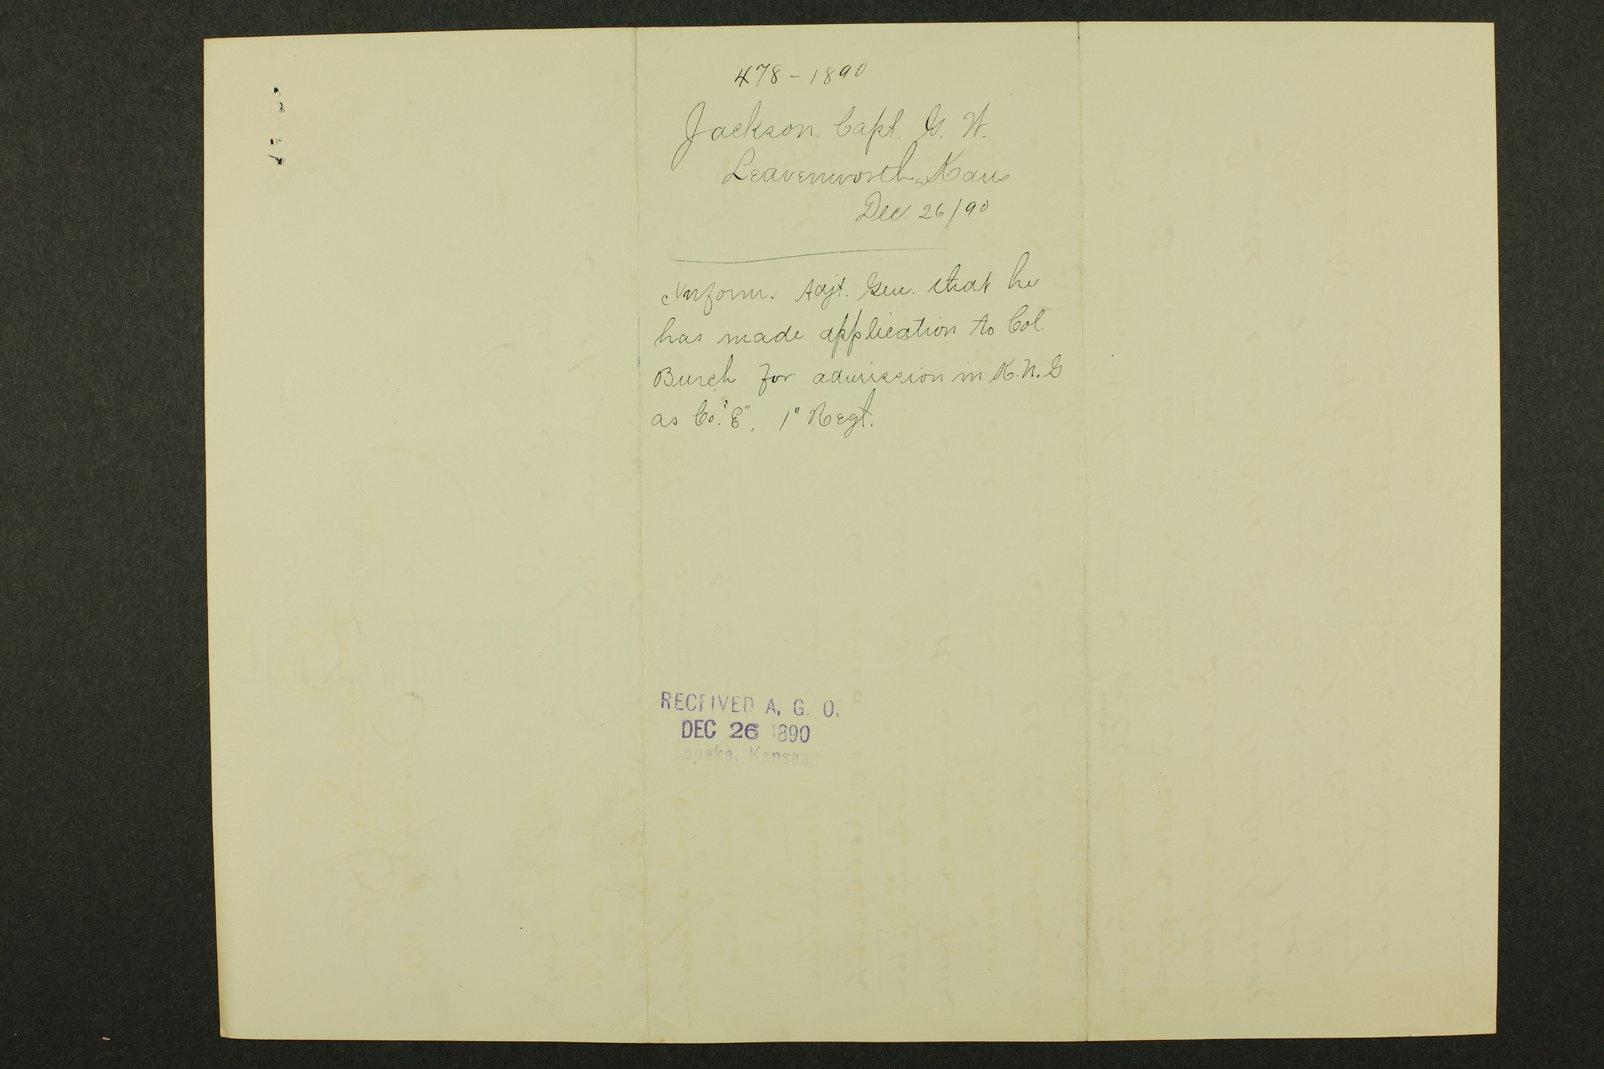 Kansas Adjutant General miscellaneous correspondence - 236